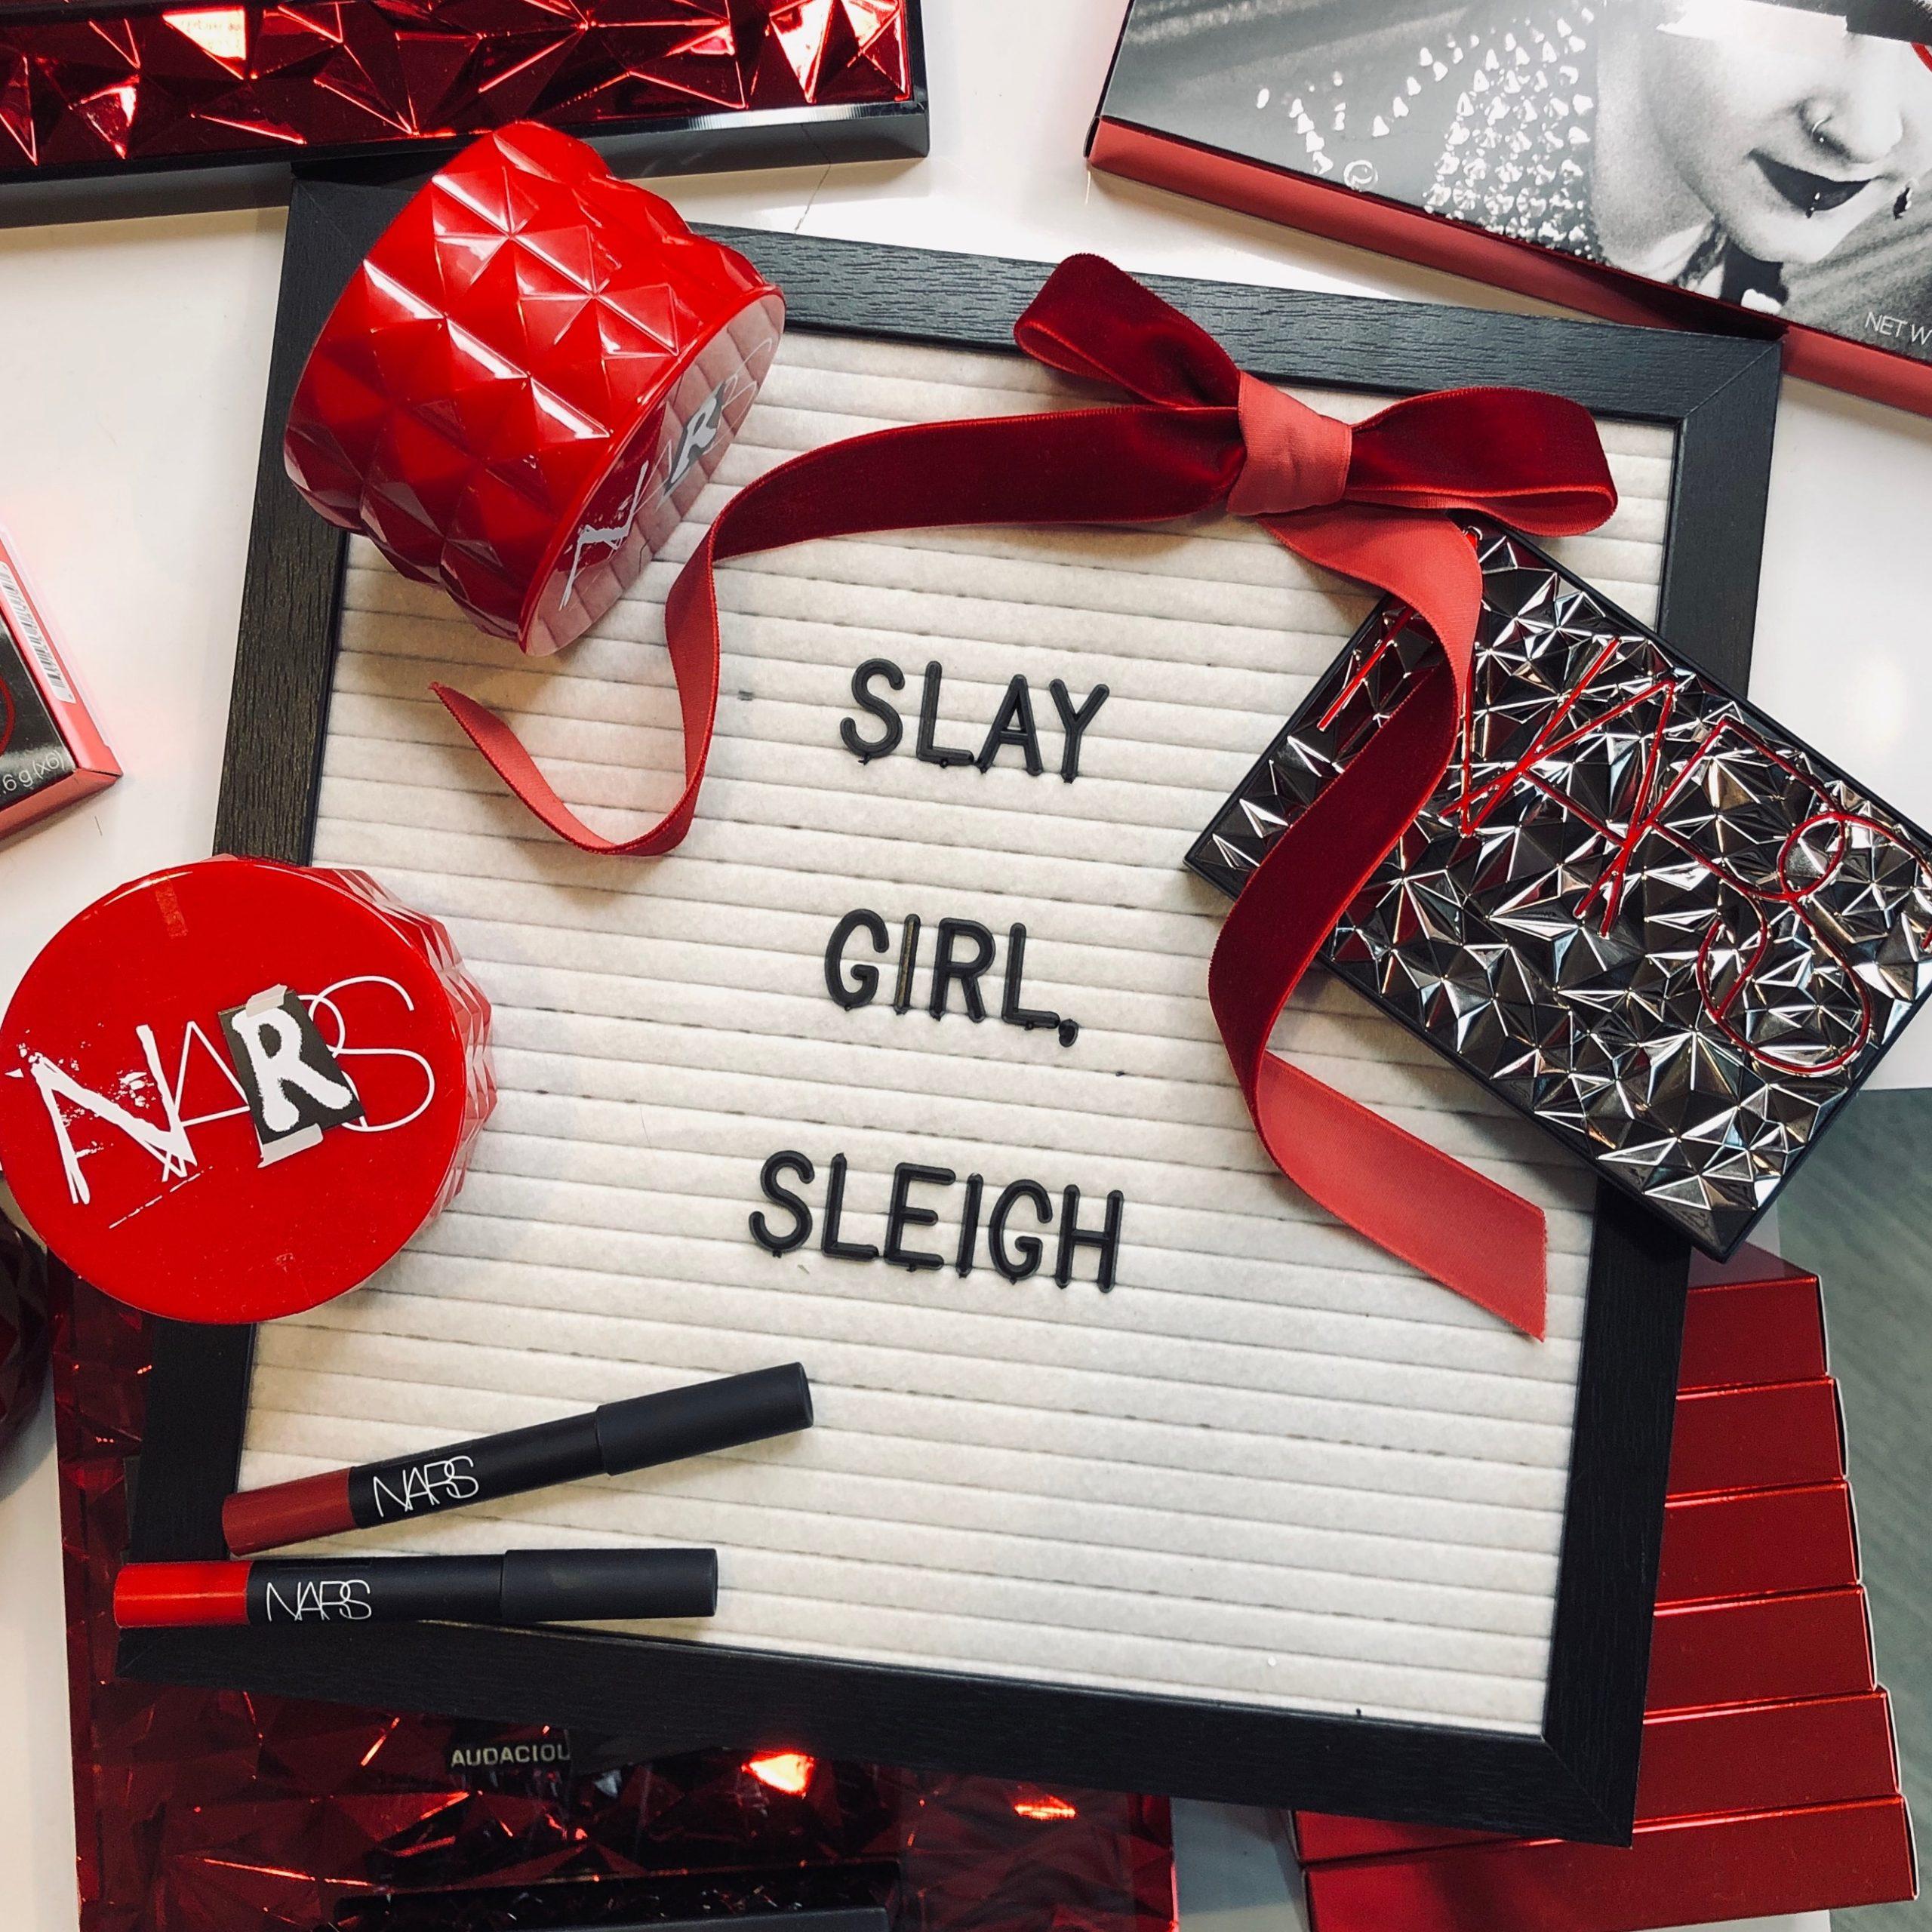 NARS December 2018 makeup event at INTERLOCKS